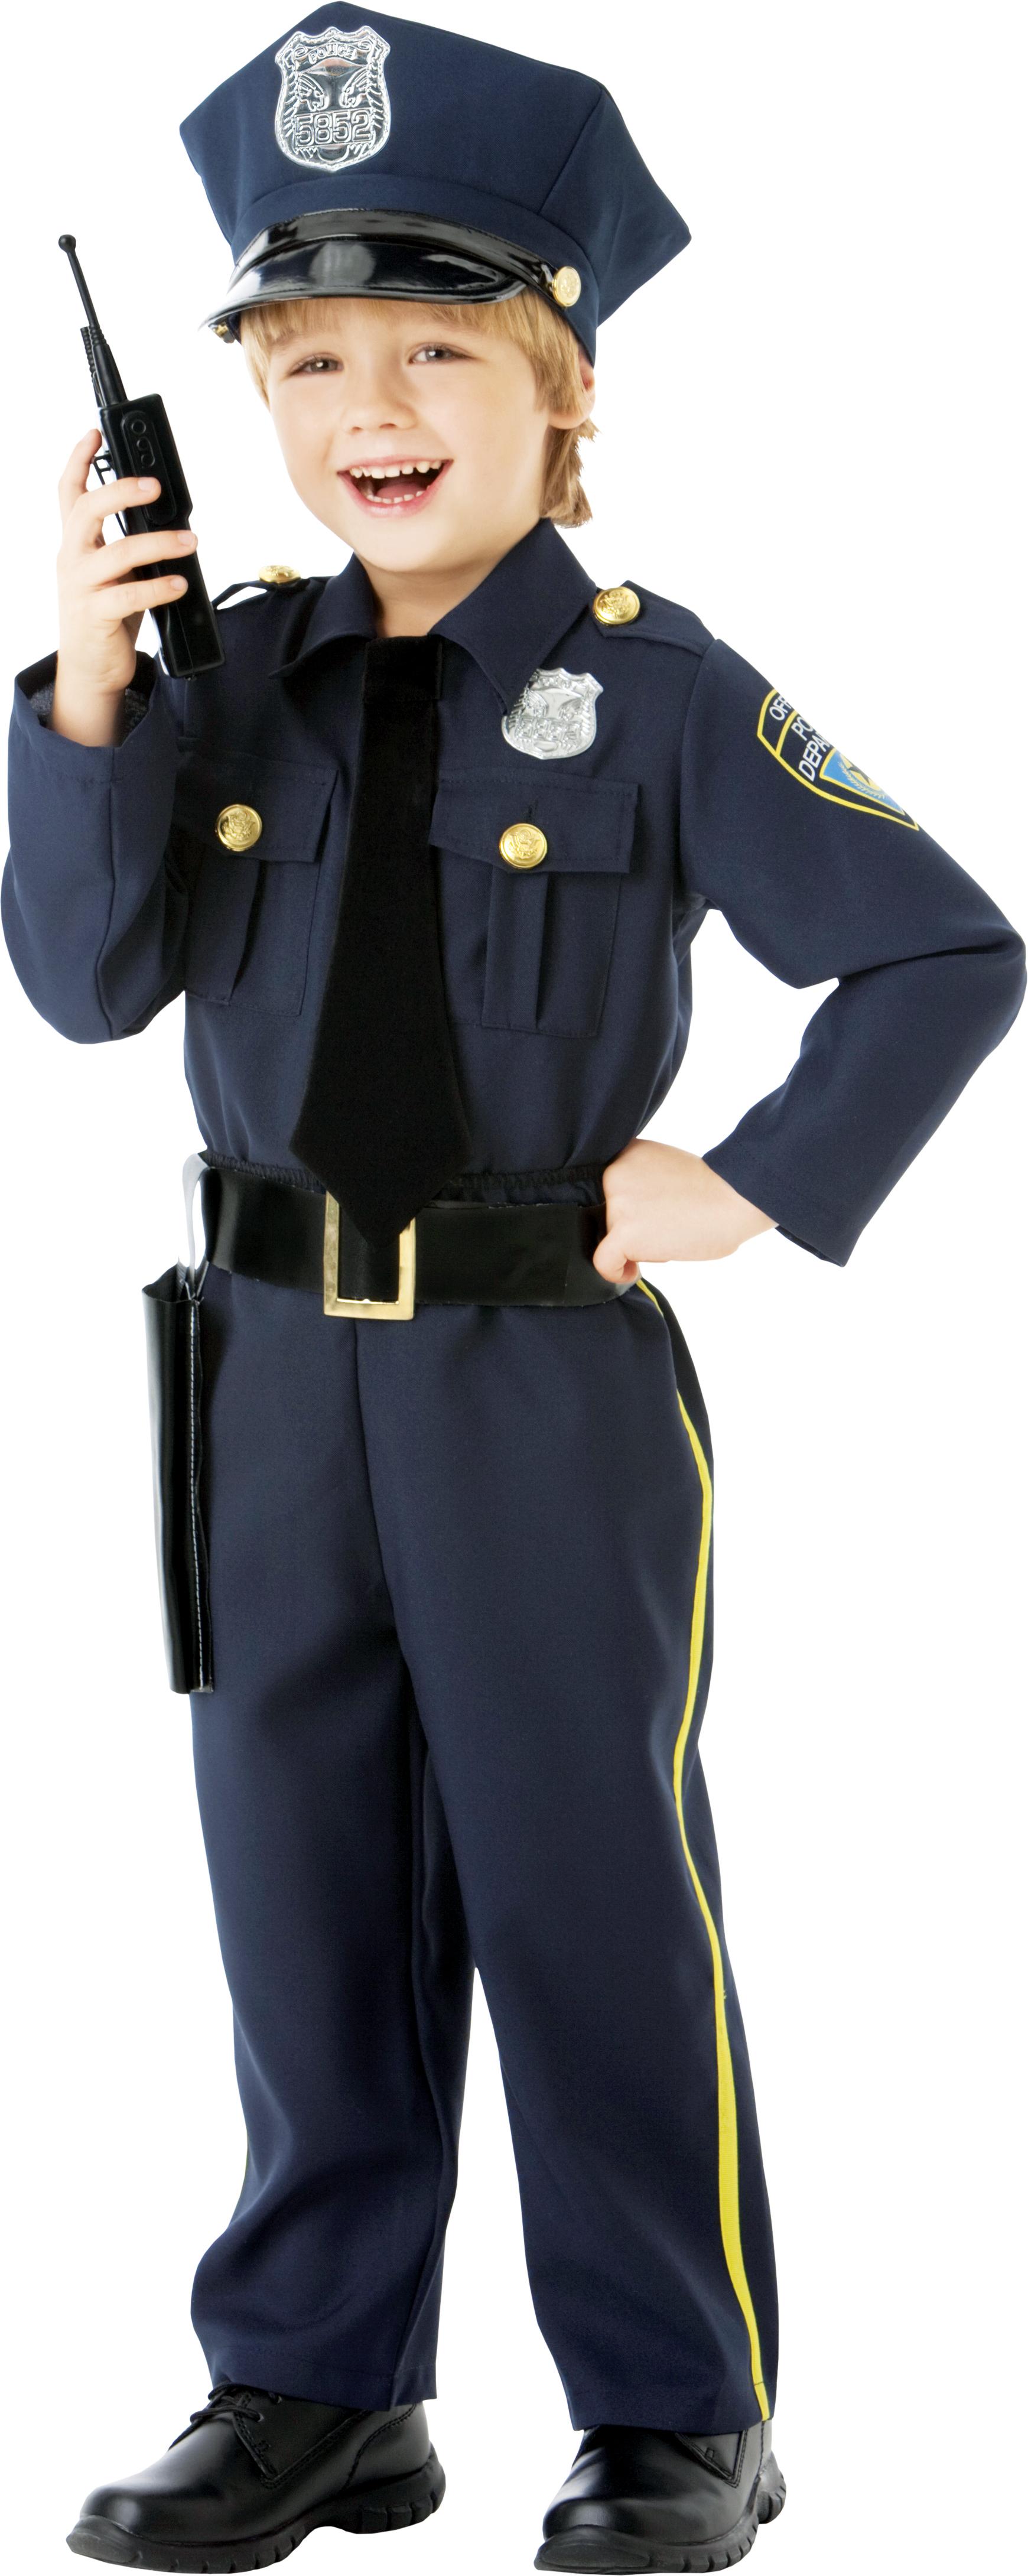 policeman officer hat boys fancy dress police cop uniform kids